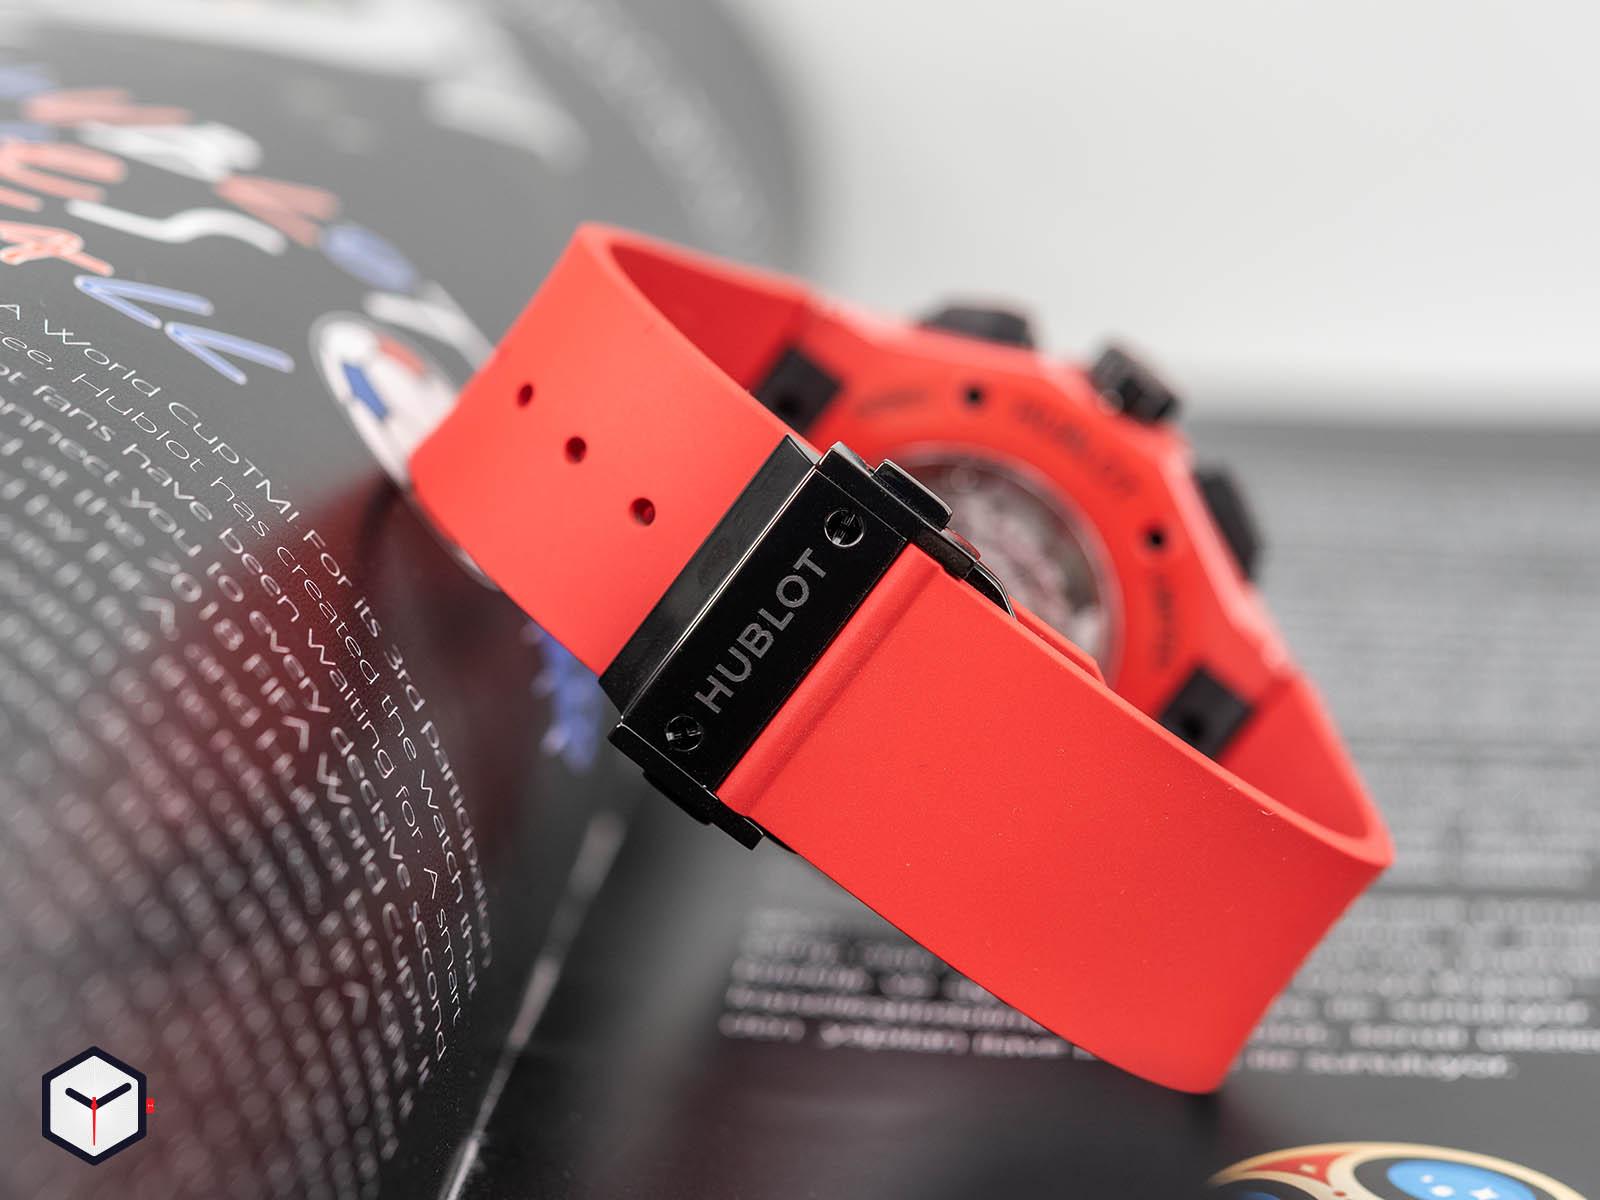 525-cf-0130-rx-orl19-hublot-classic-fusion-chronograph-orlinski-red-ceramic-7.jpg